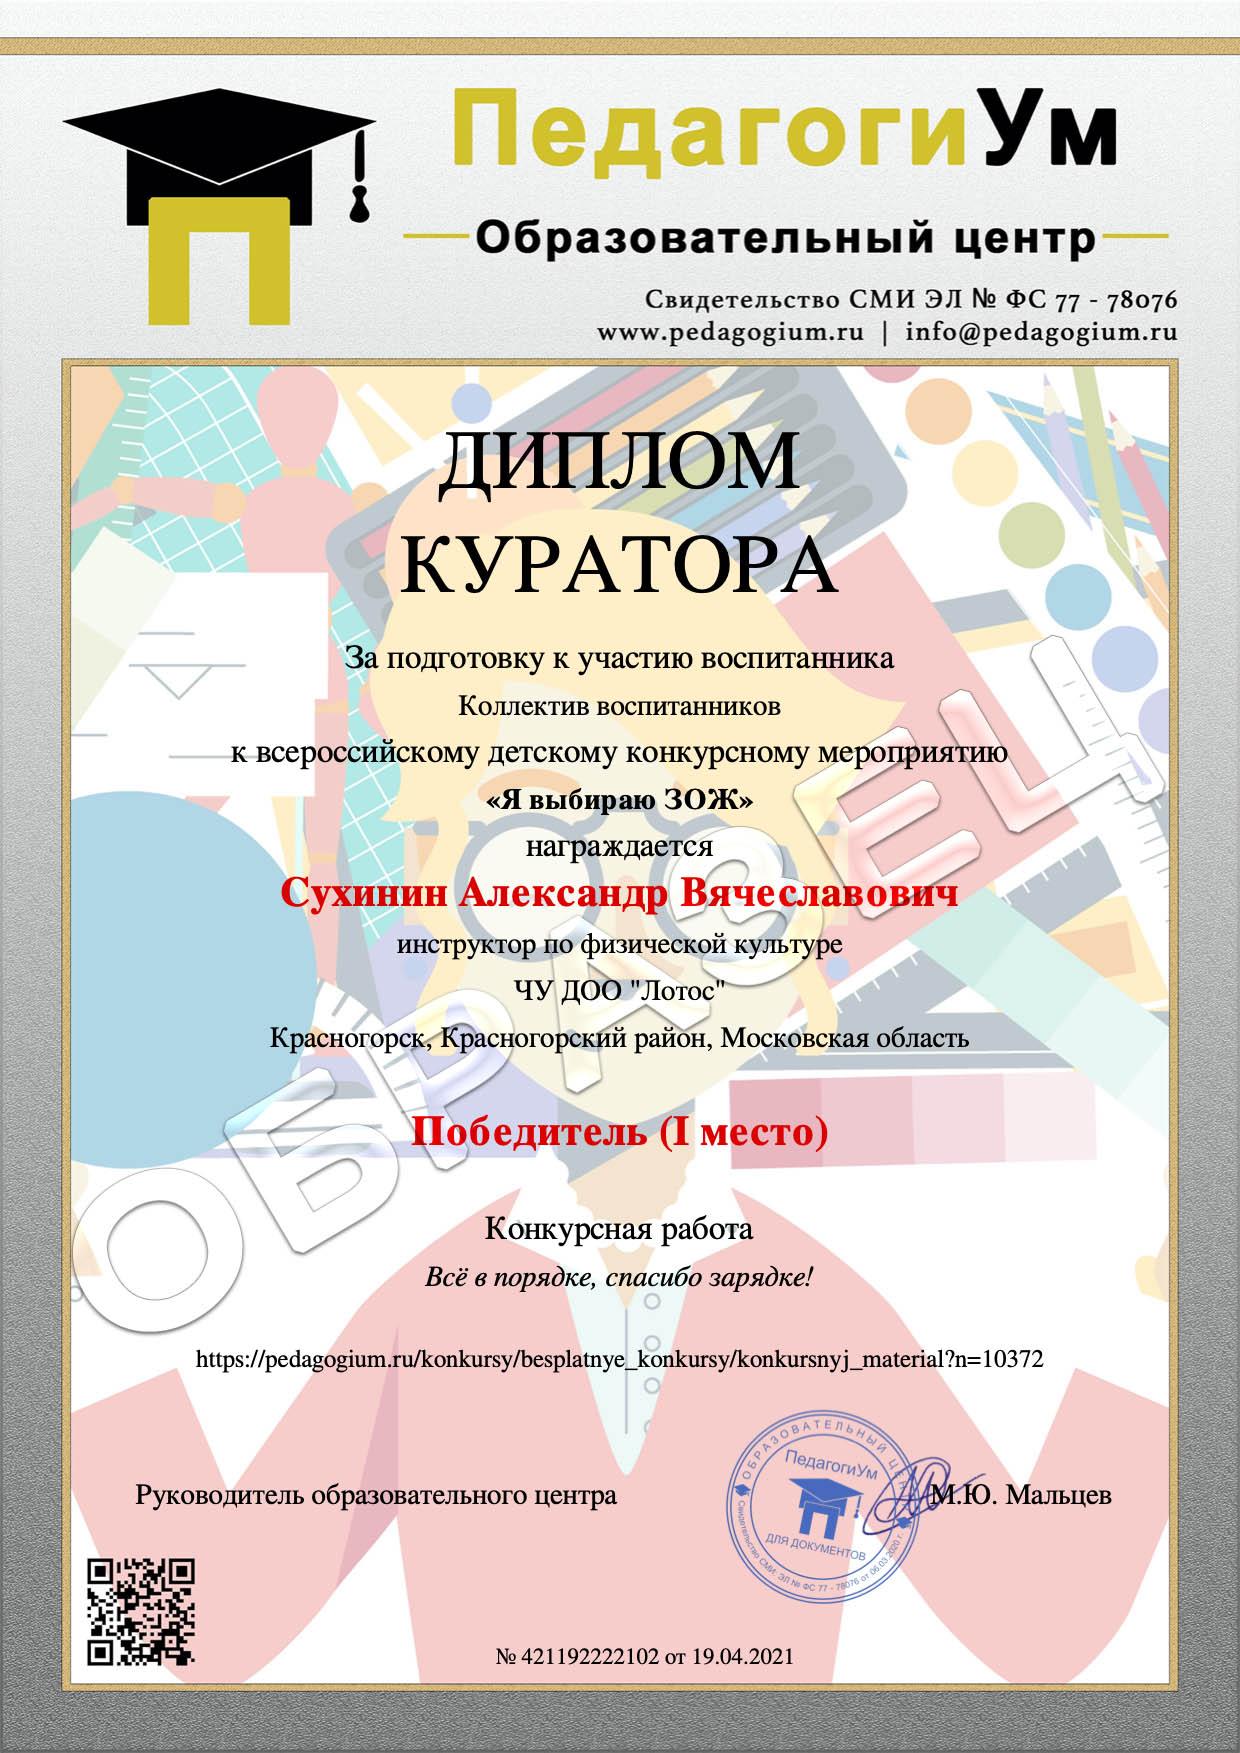 Образец документа педагогу-куратору бесплатного детского конкурса центра ПедагогиУм.